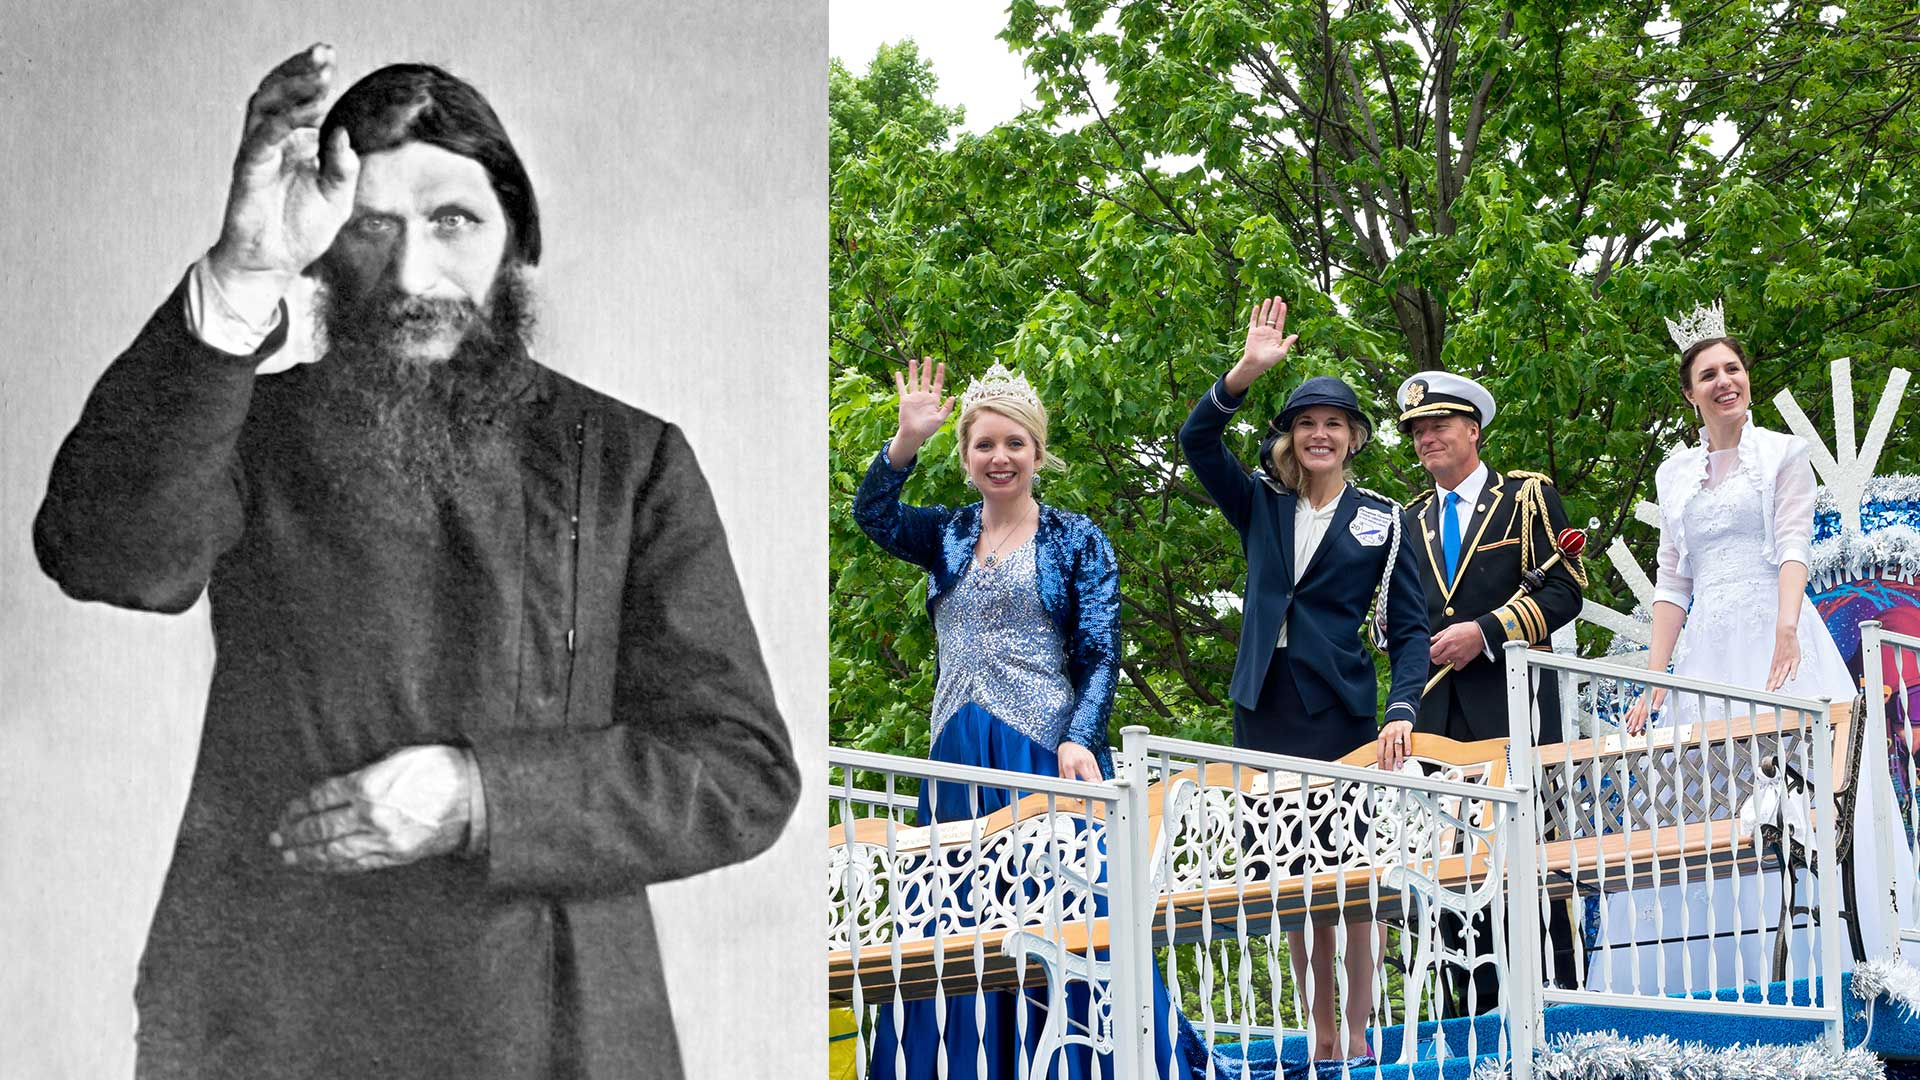 2019-St-Paul-Winter-Carnival-Royal-Family-Falls-Under-Spell-of-Mysterious-Russian-Mystic.jpg